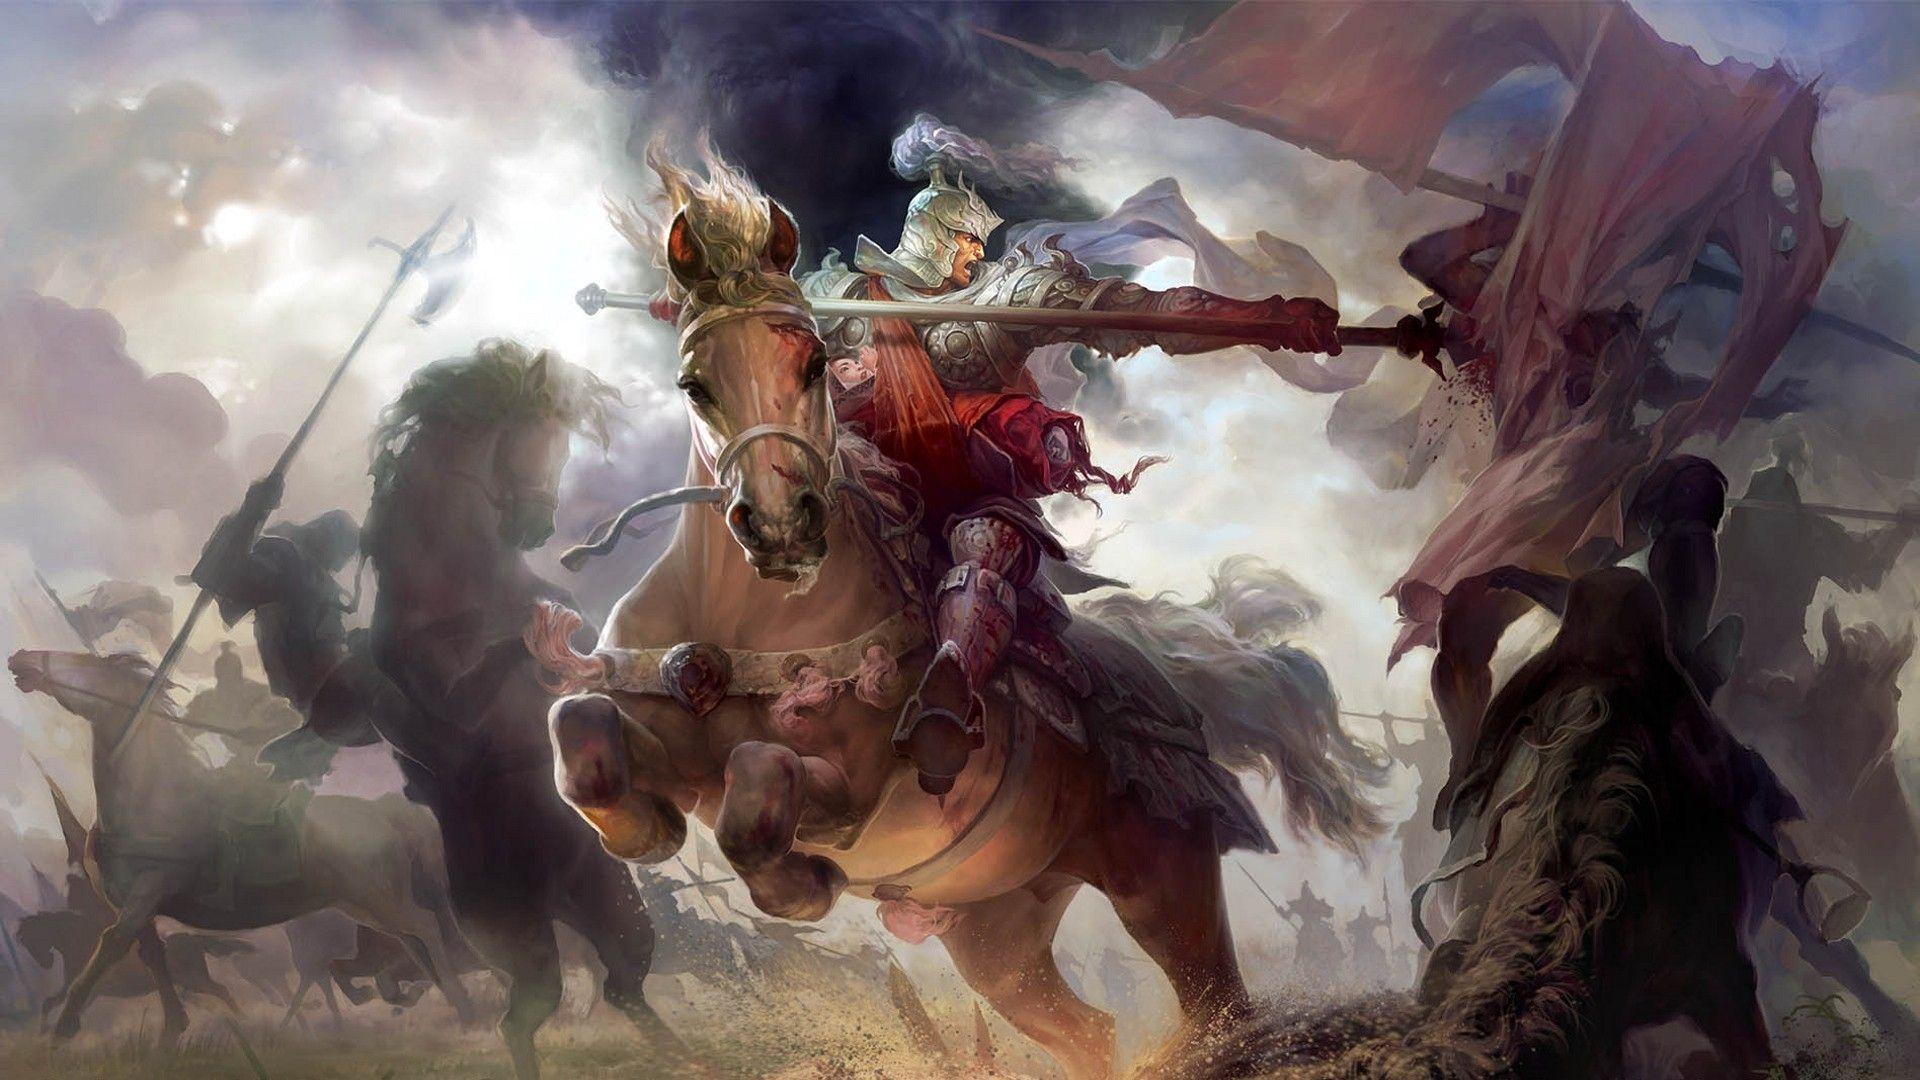 Top Wallpaper Horse Warrior - 9e3493b5cdf75b6ddfc8bff7ee62919a  Image_108171.jpg